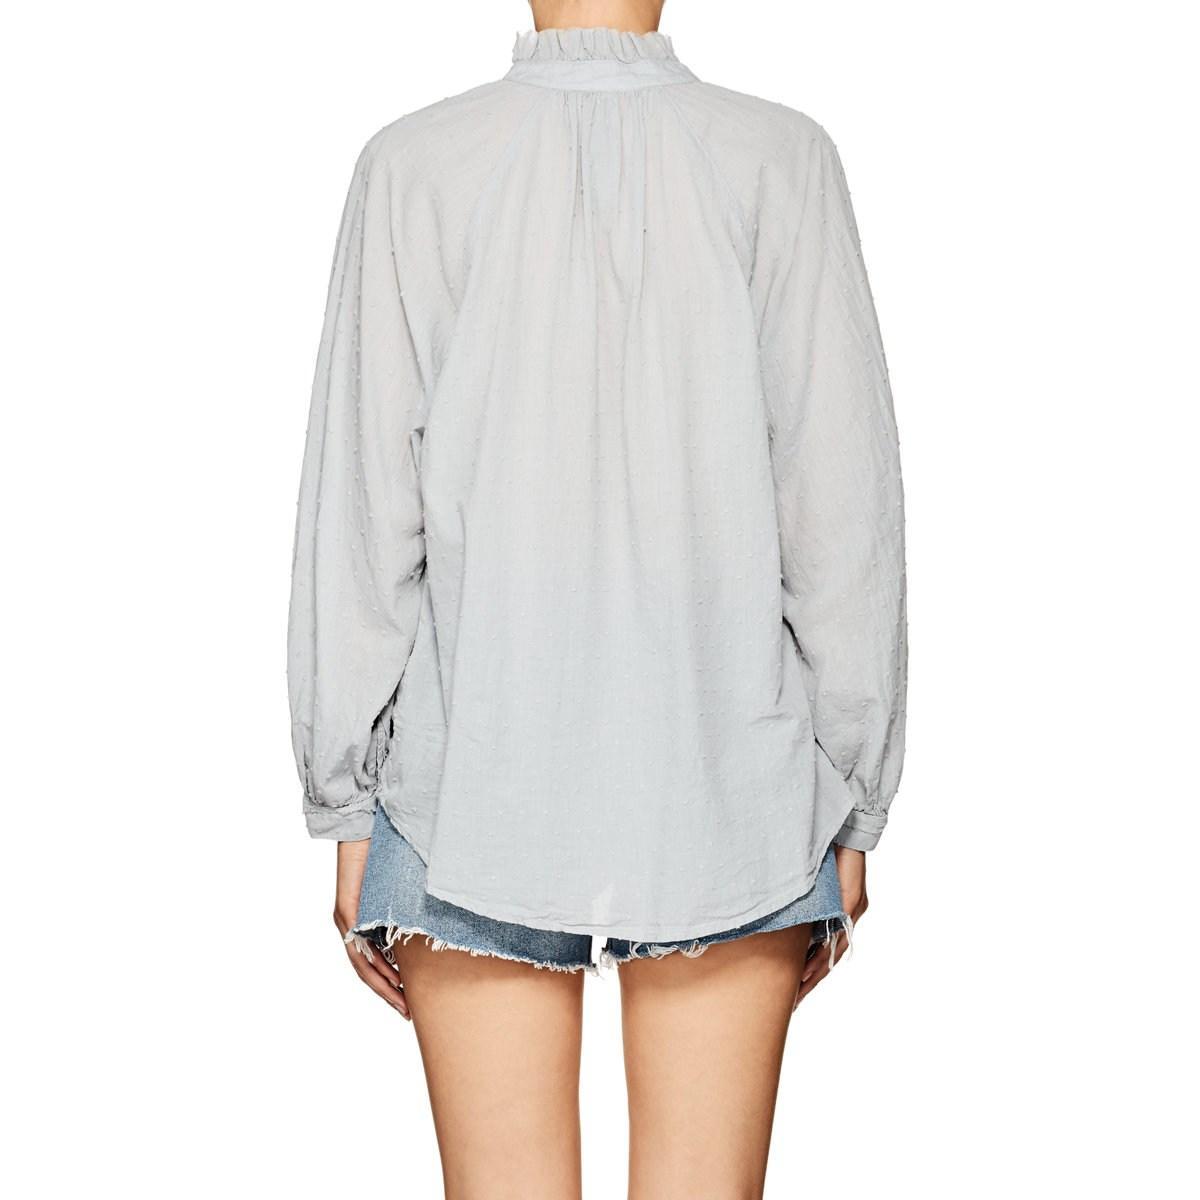 ad1048f5d5e3d7 Lyst - Raquel Allegra Swiss Dot Cotton Blouse Size 0 in Blue